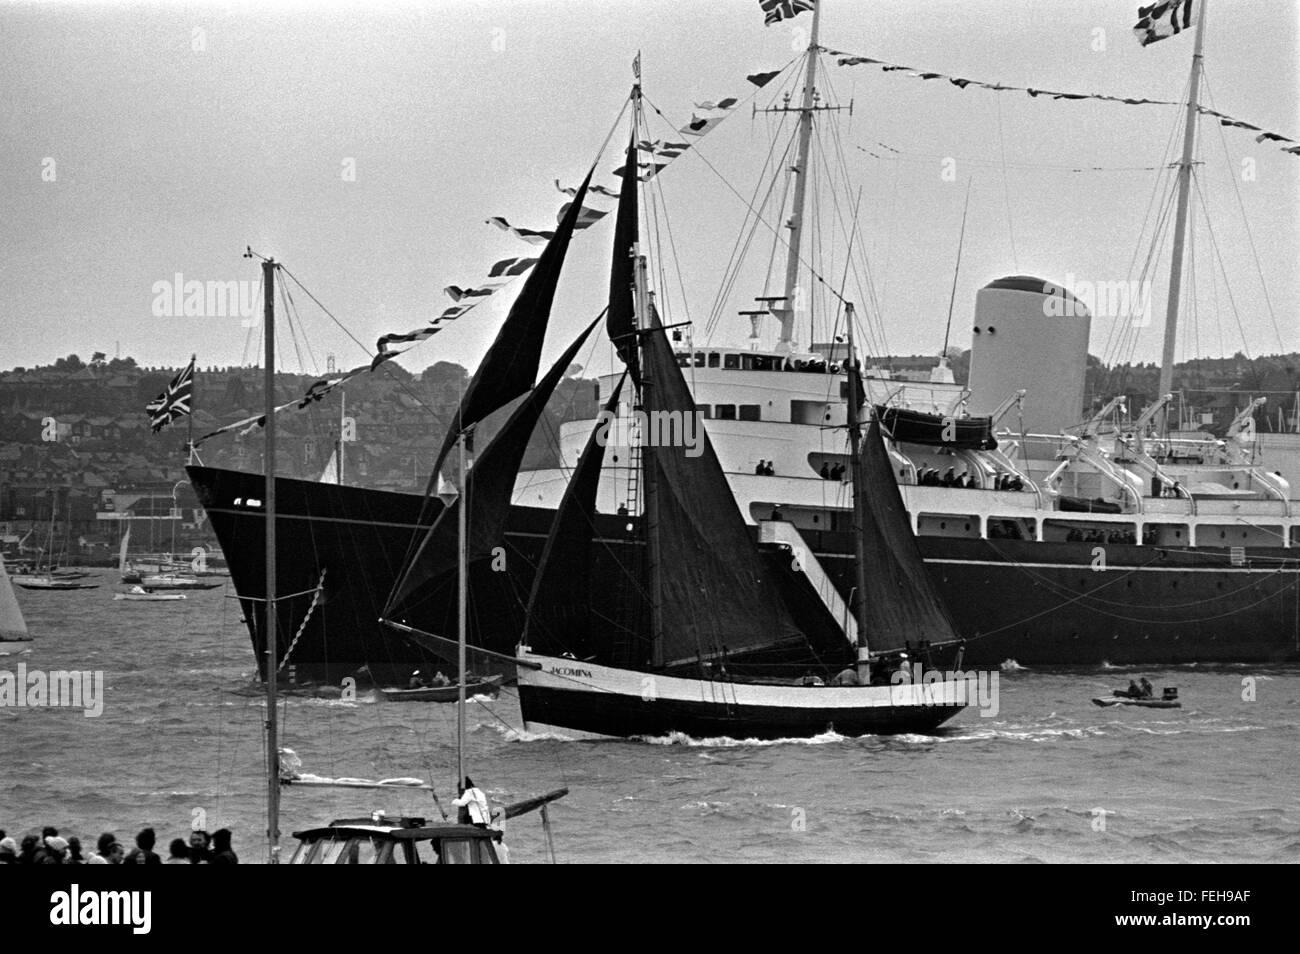 AJAX NEWS PHOTOS. 4TH AUGUST, 1974. COWES, ENGLAND. - ROYAL YACHT REVIEWS TALL SHIPS - THE TRAINING SHIP JACOMINA - Stock Image